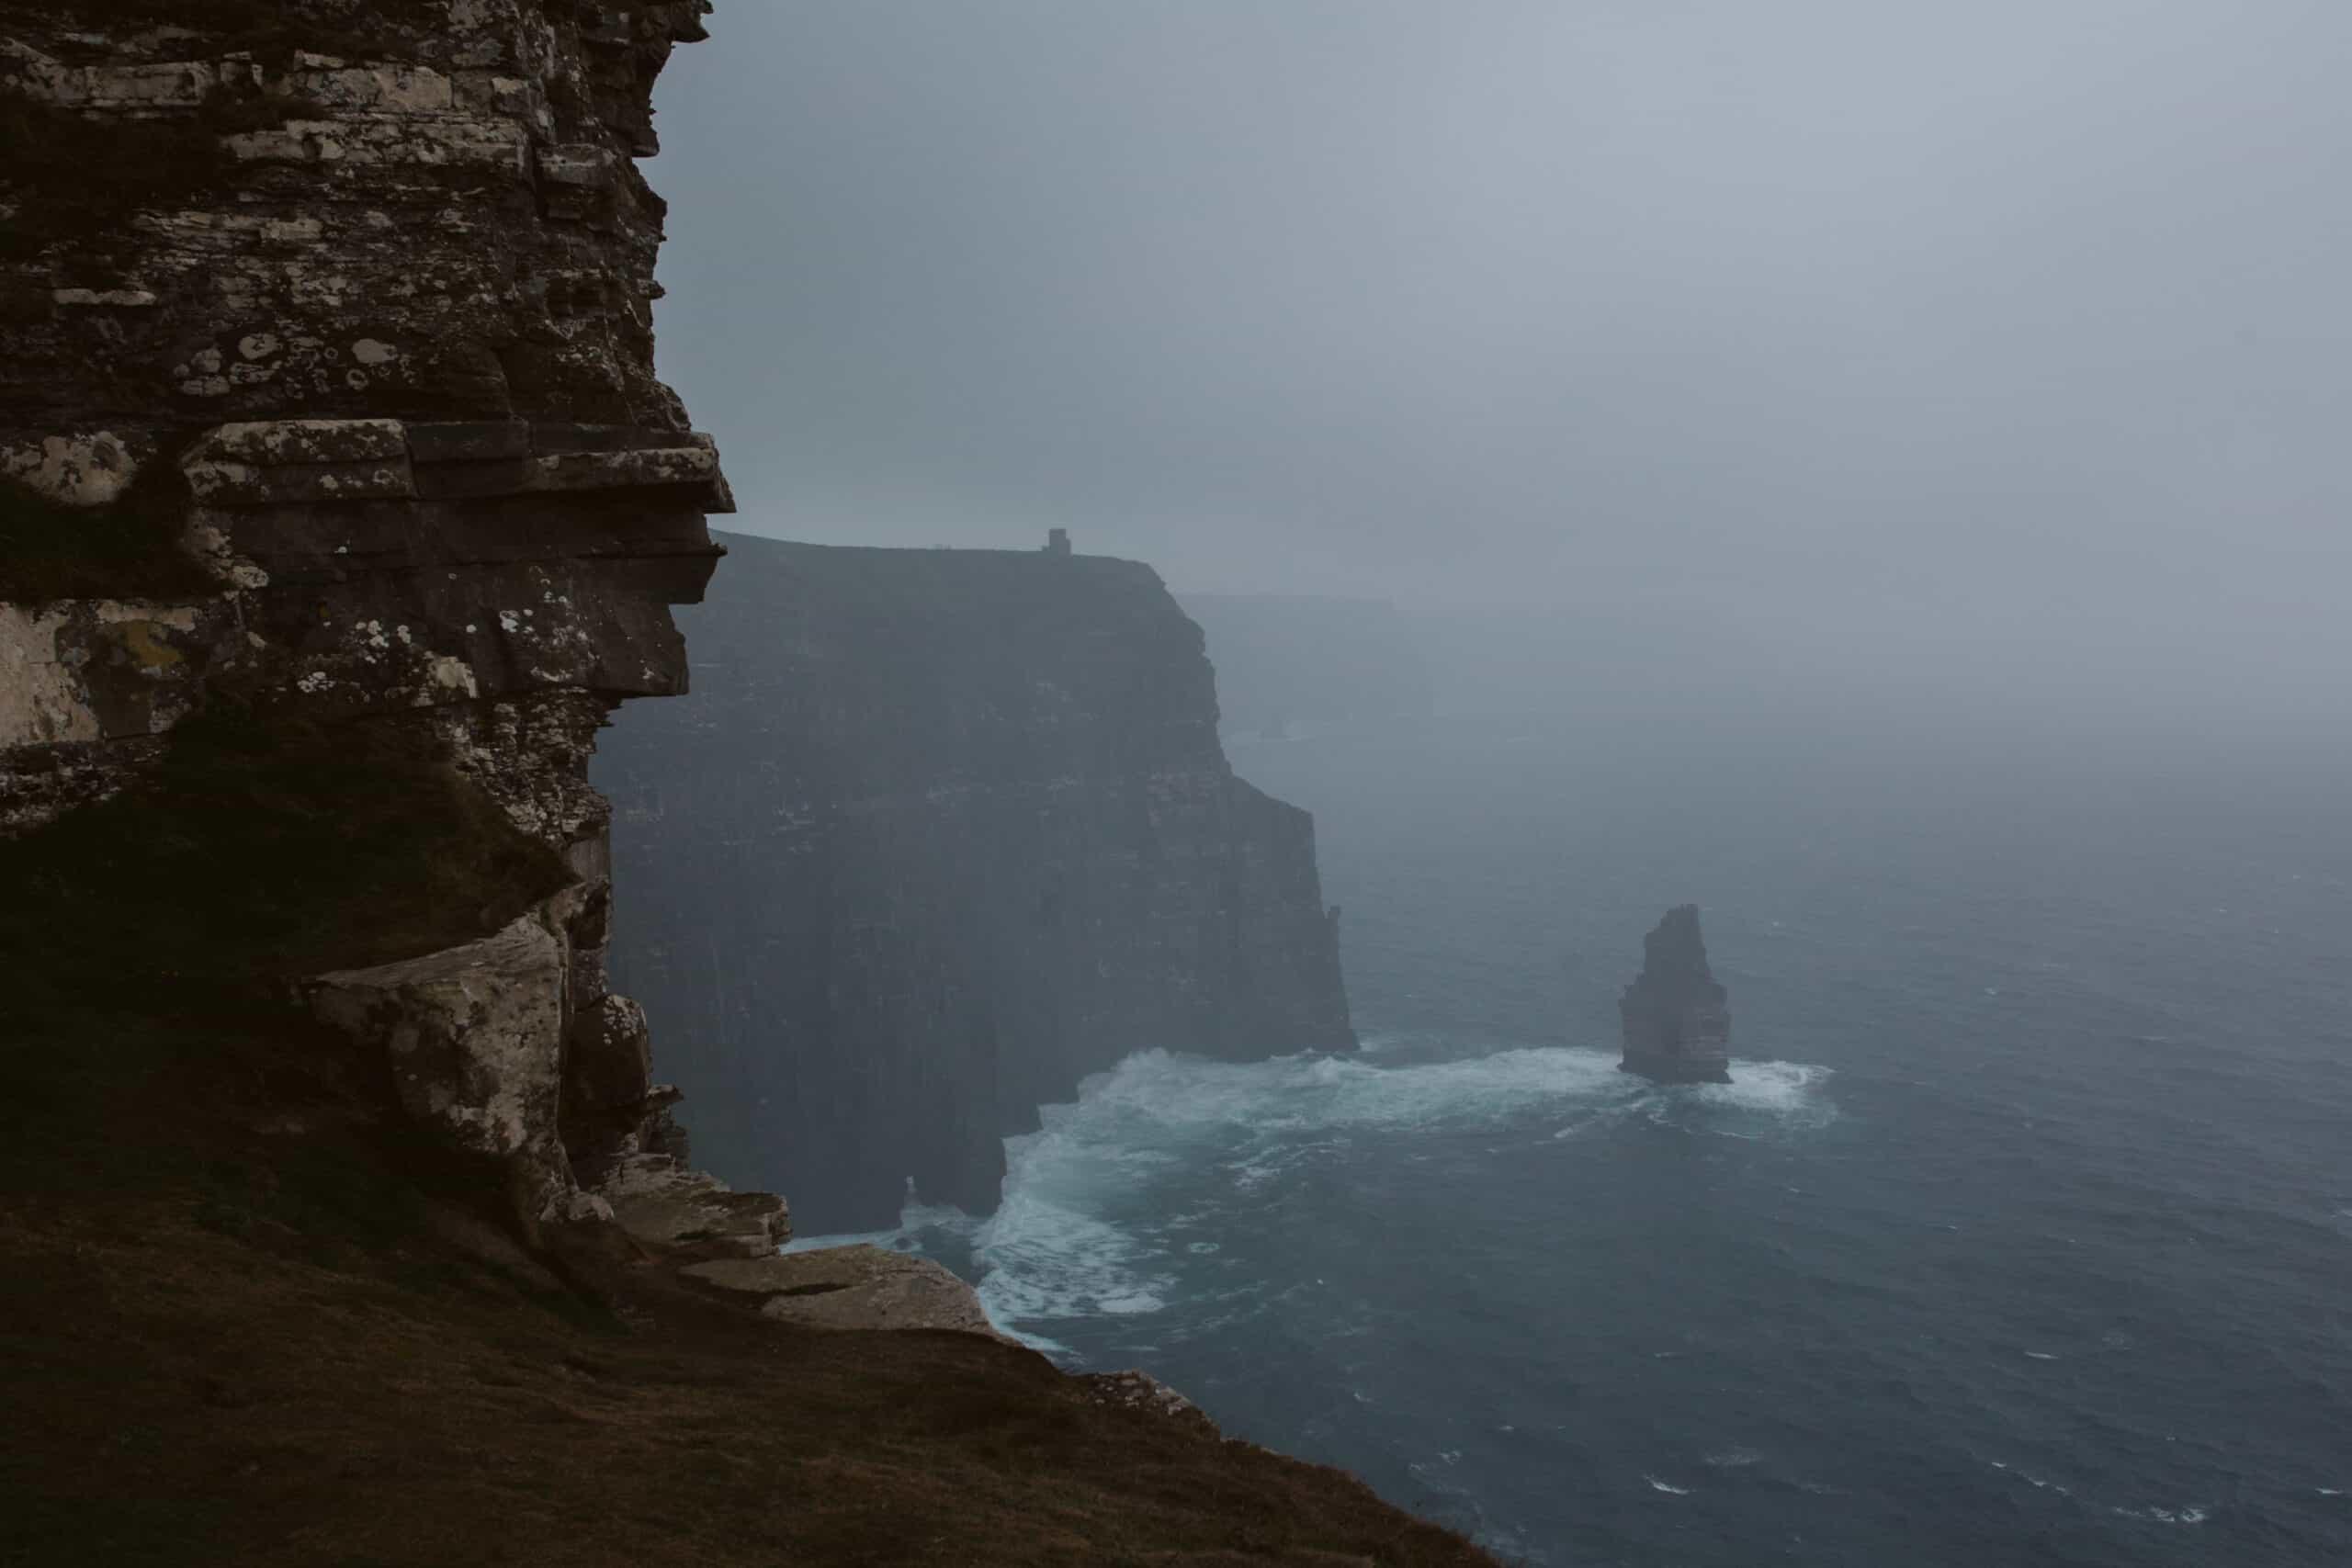 Cliffs of Moher Wedding Hags head, rain at the cliffs